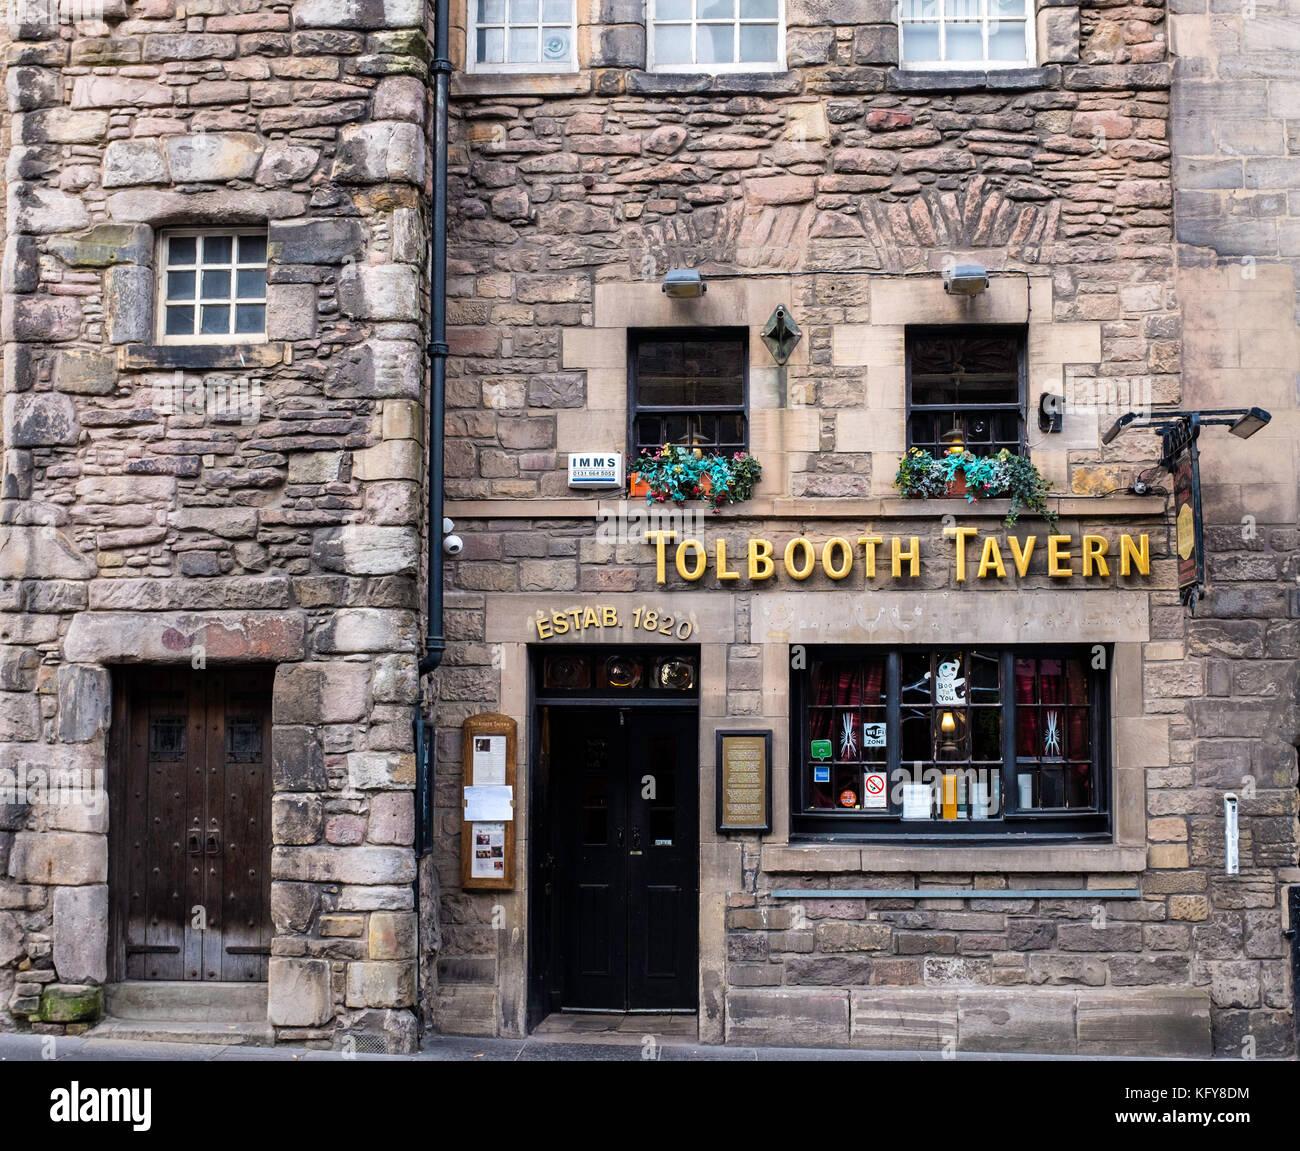 Exterior of Tolbooth Tavern pub on the Royal Mile in Edinburgh, Scotland, United Kingdom. - Stock Image